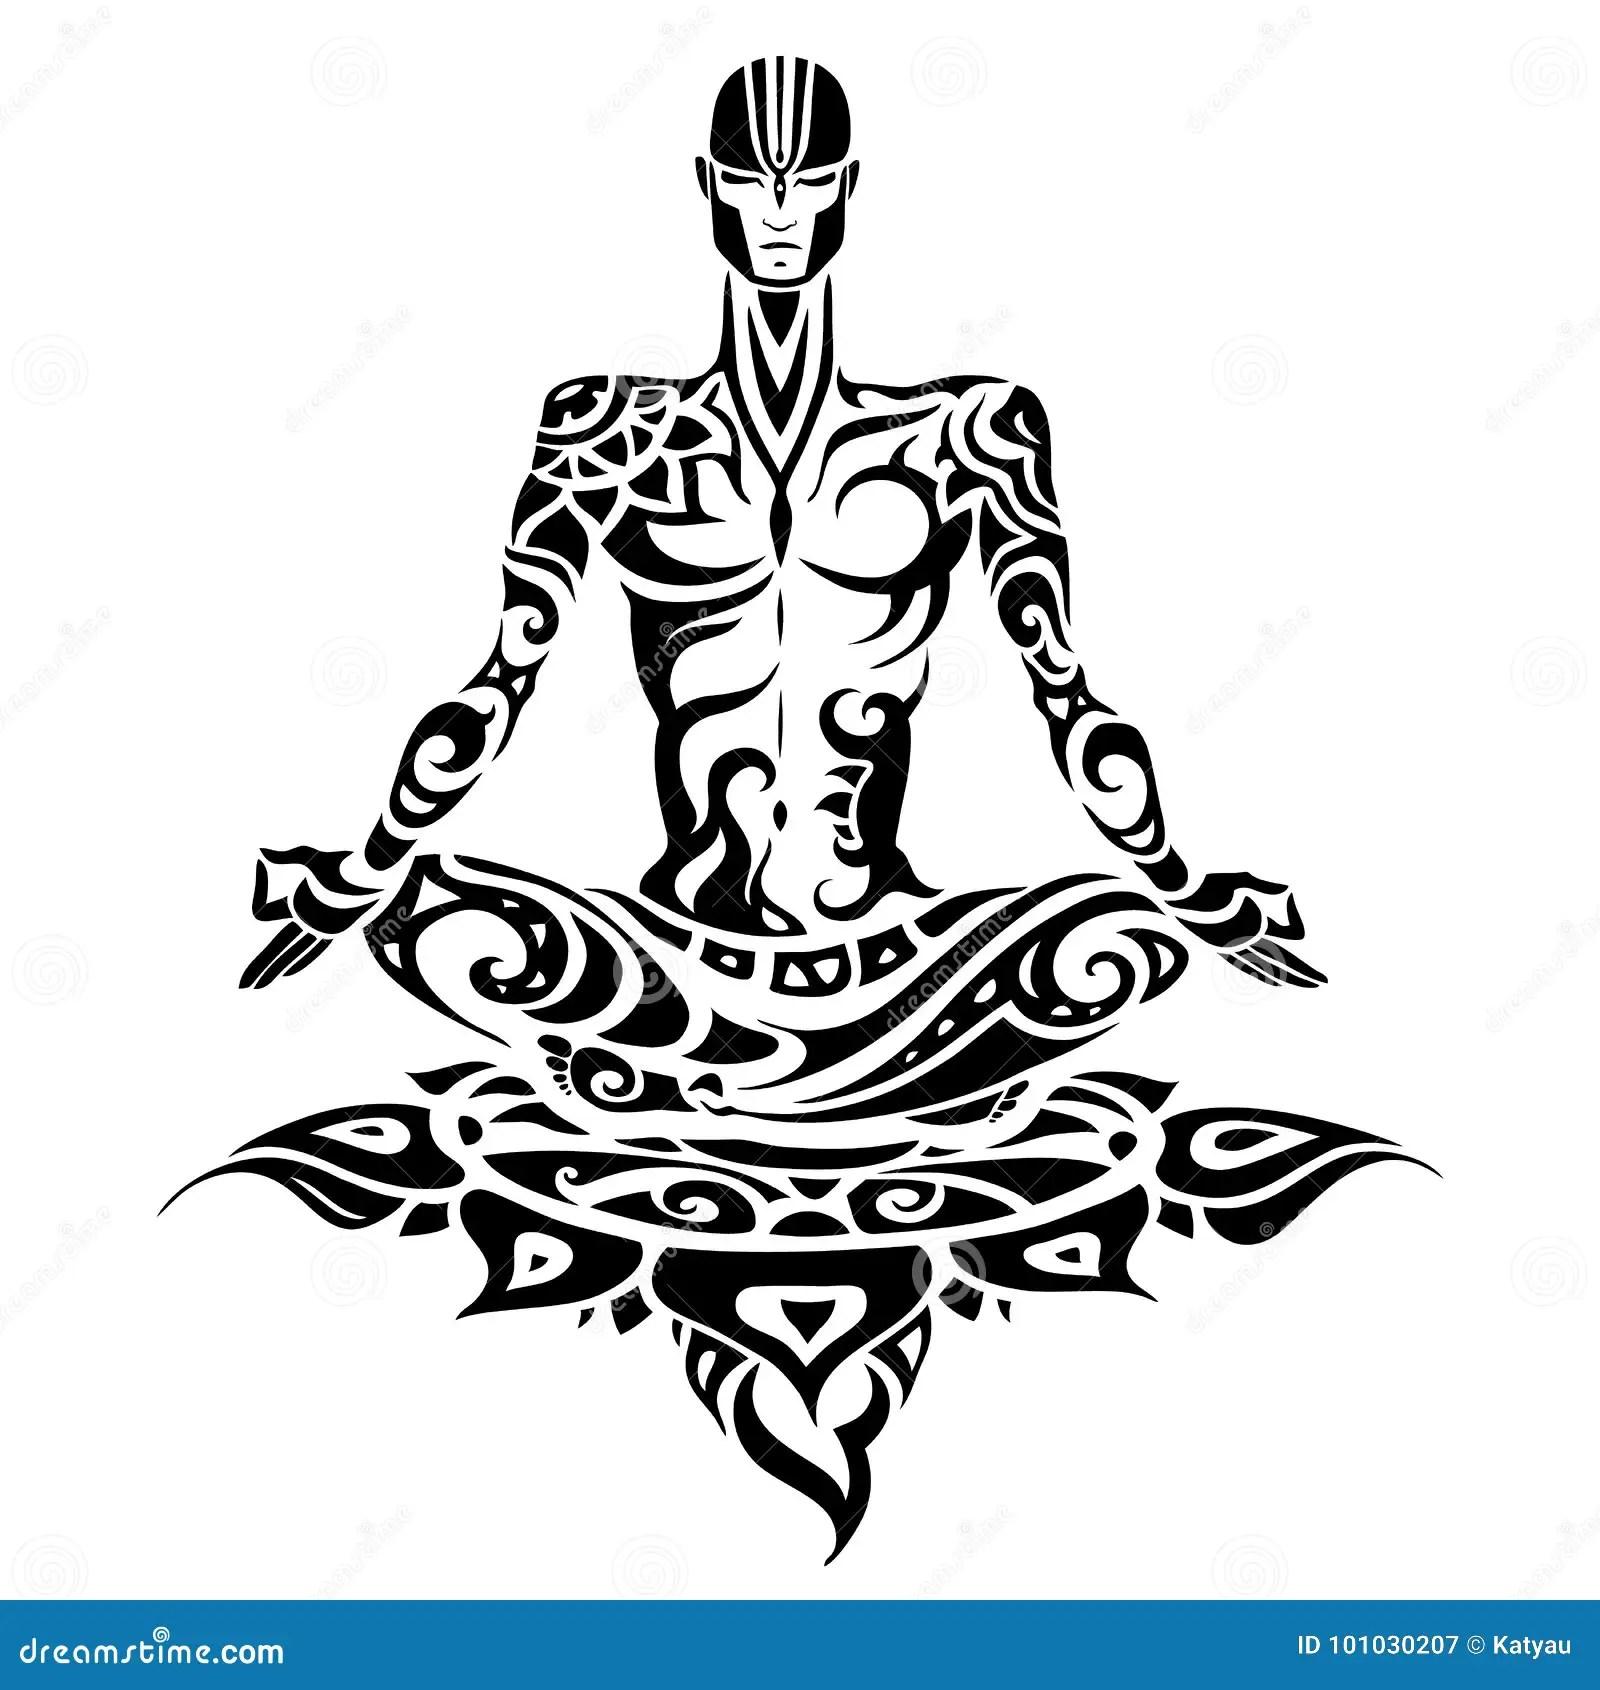 Meditation Yoga Man Silhouette Stock Illustration